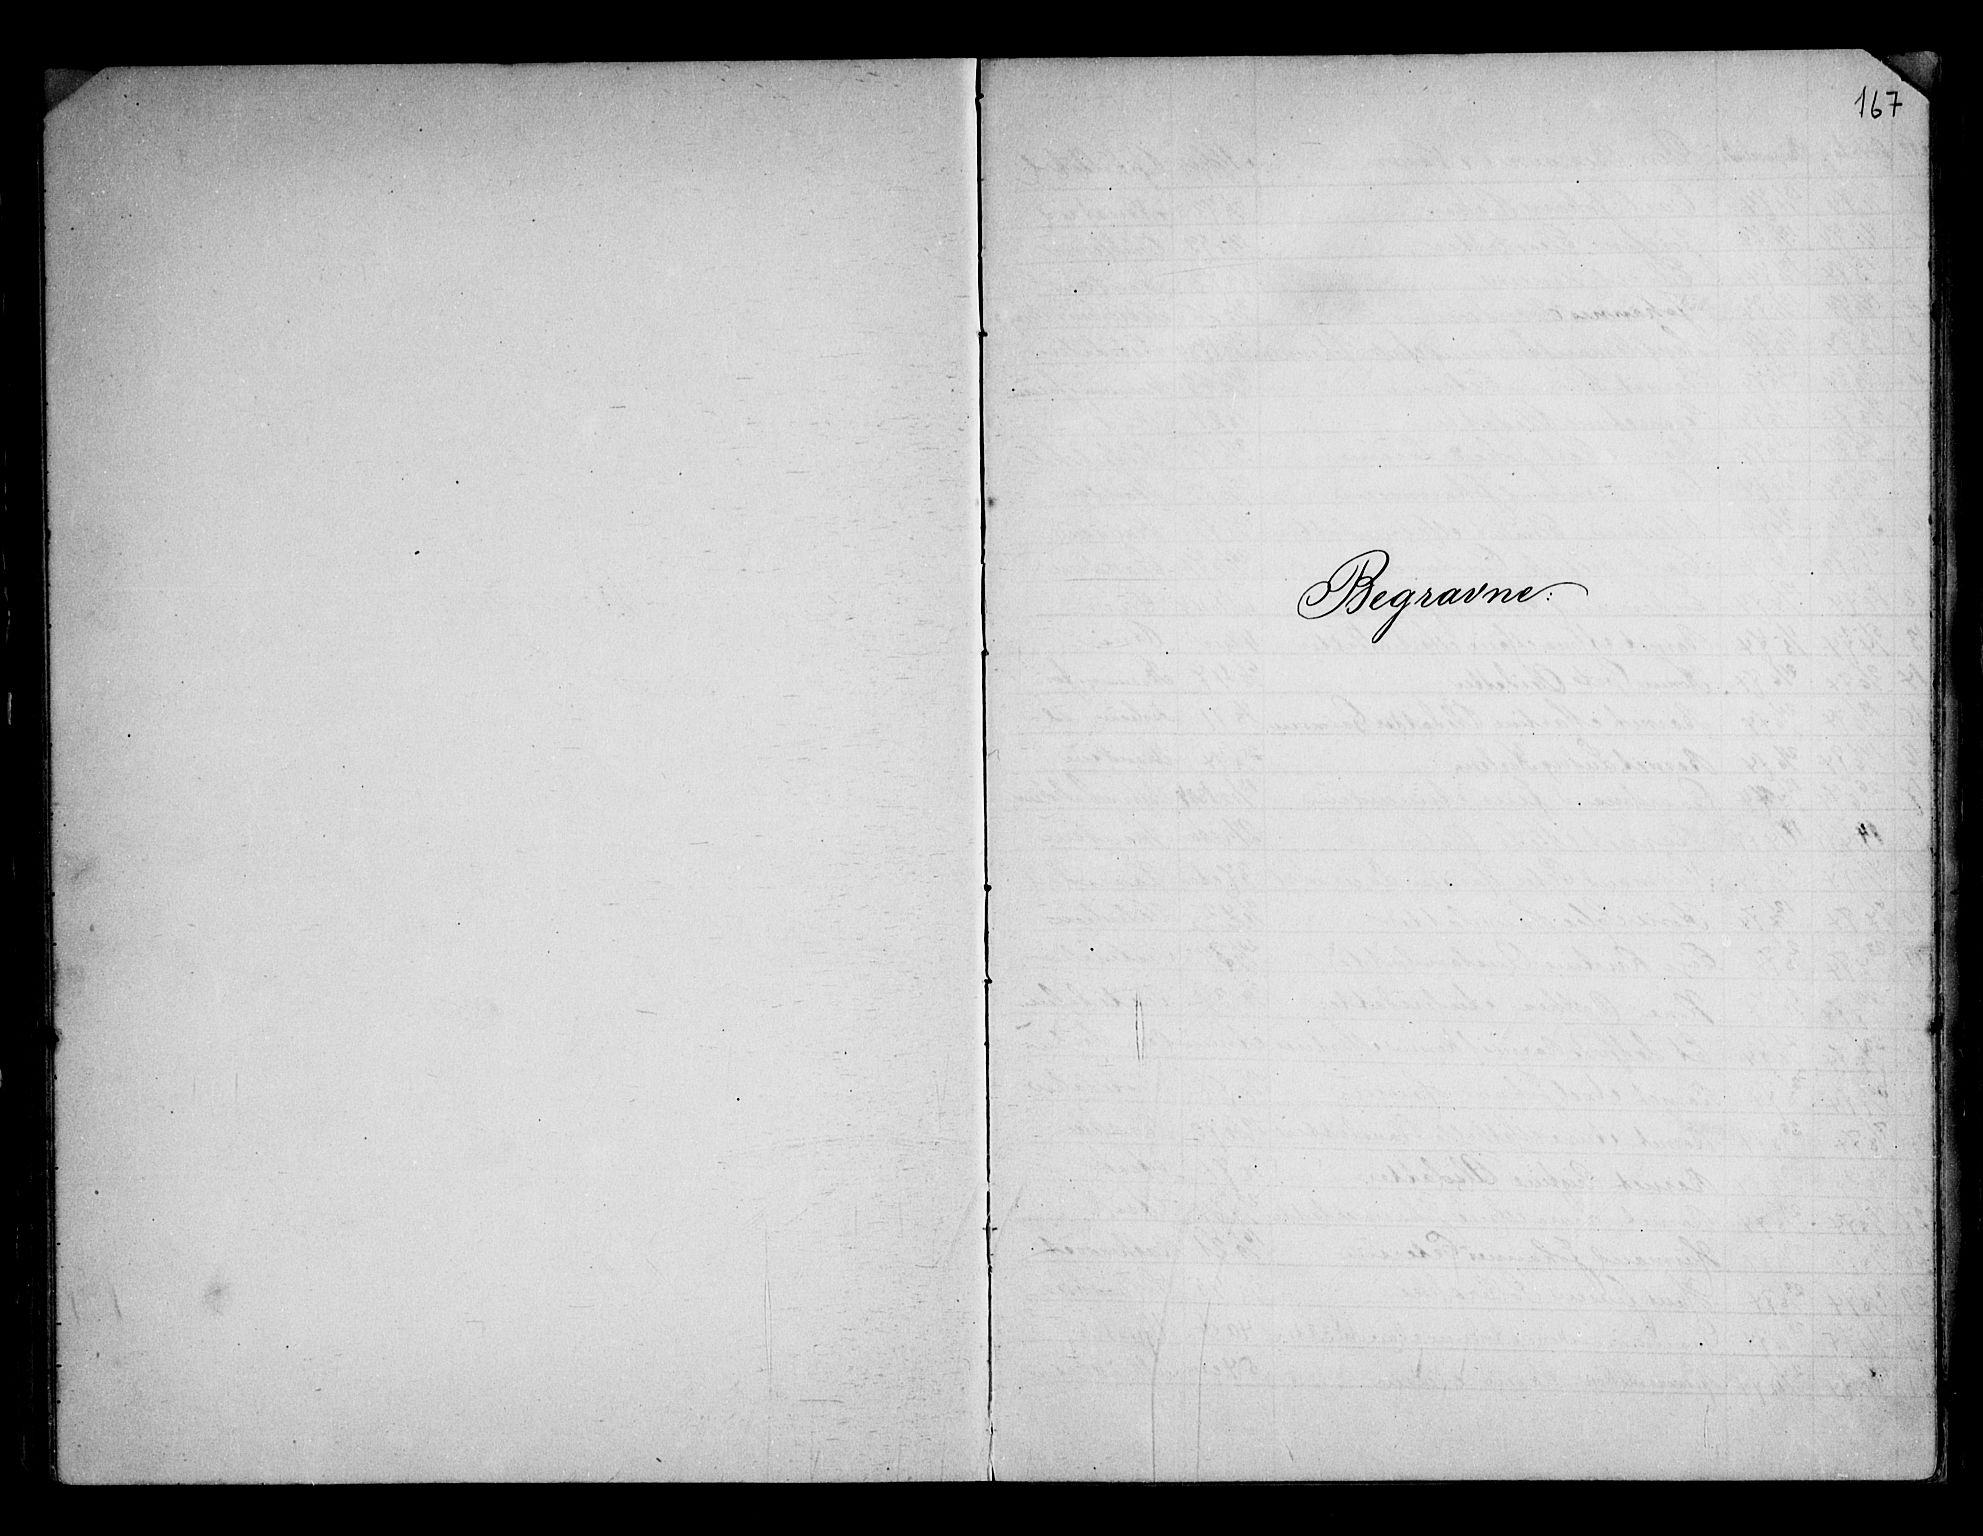 SAO, Berg prestekontor Kirkebøker, G/Gb/L0001: Klokkerbok nr. II 1, 1874-1946, s. 167